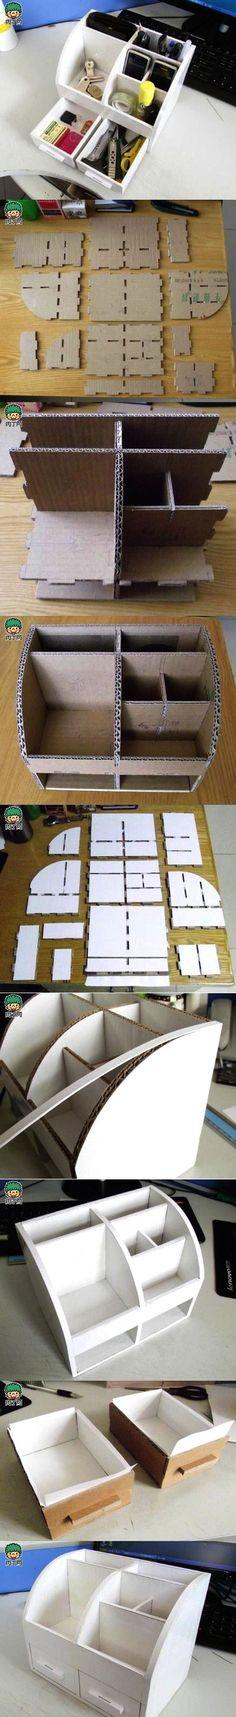 Homemade versatile storage box storage box DIY illustrations